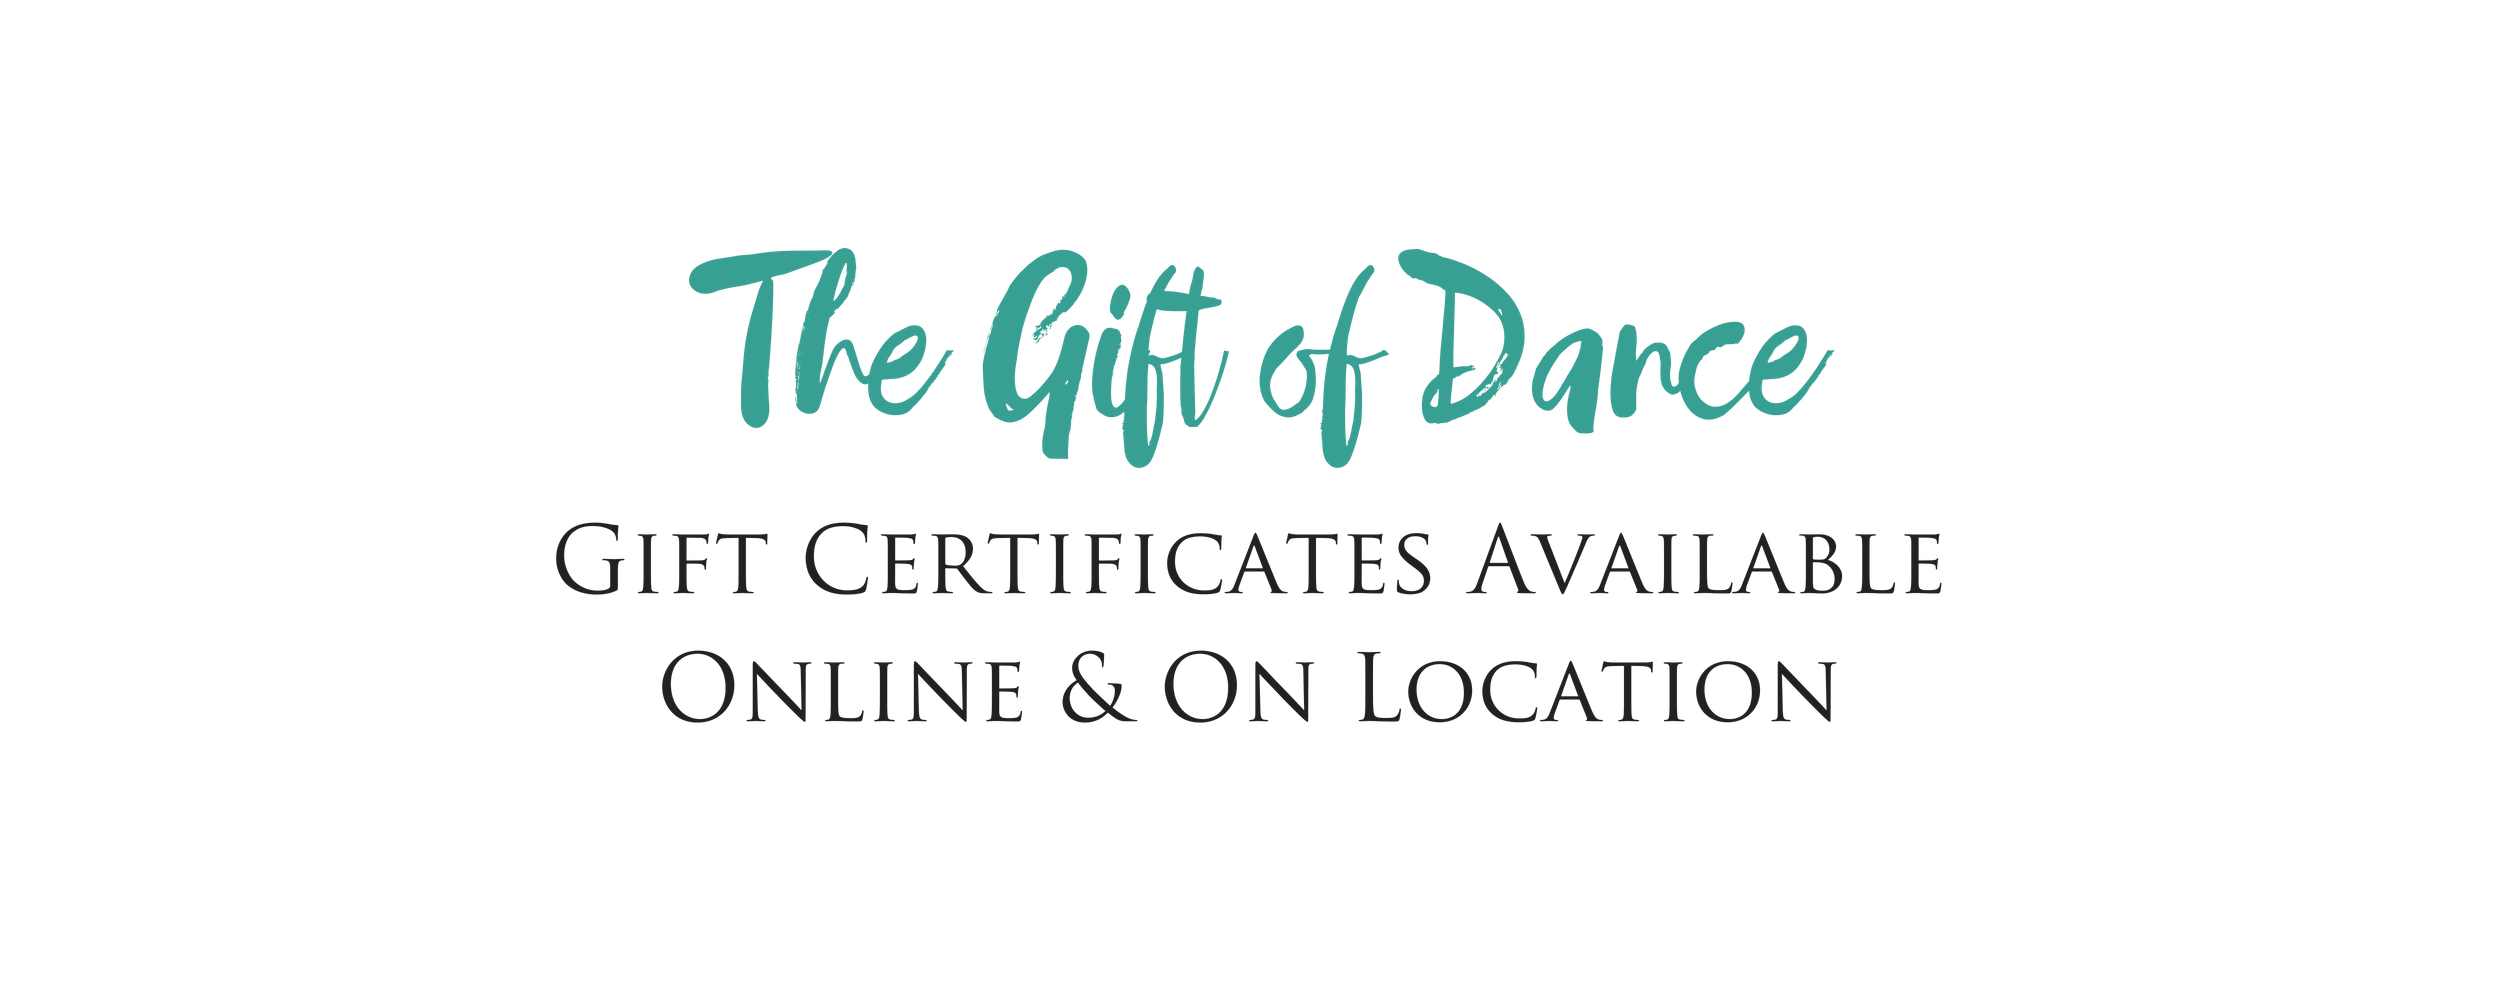 salsa dance gift certificate